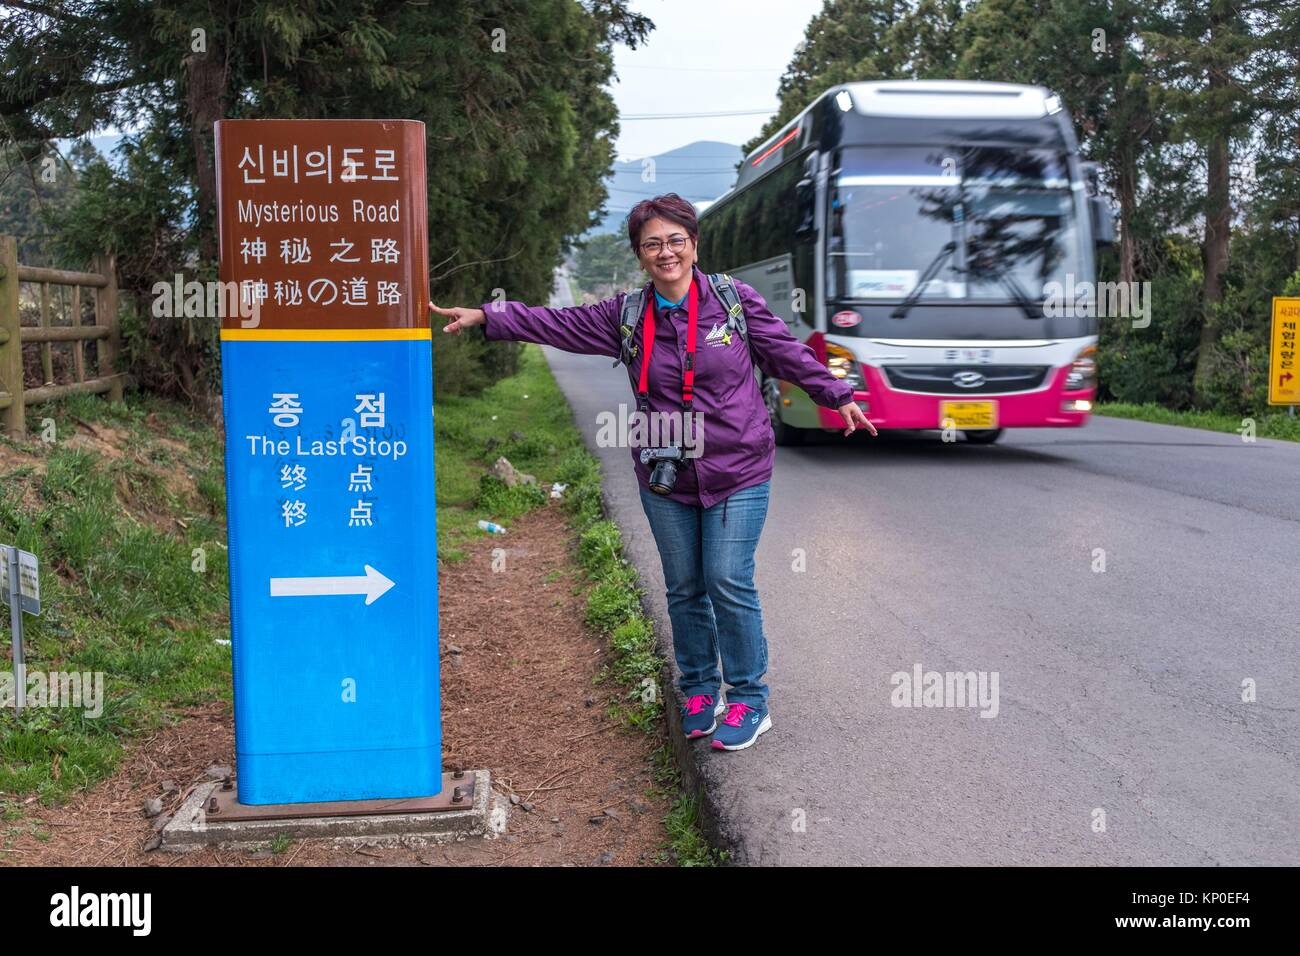 Jeju mysterious road, Korea - Stock Image